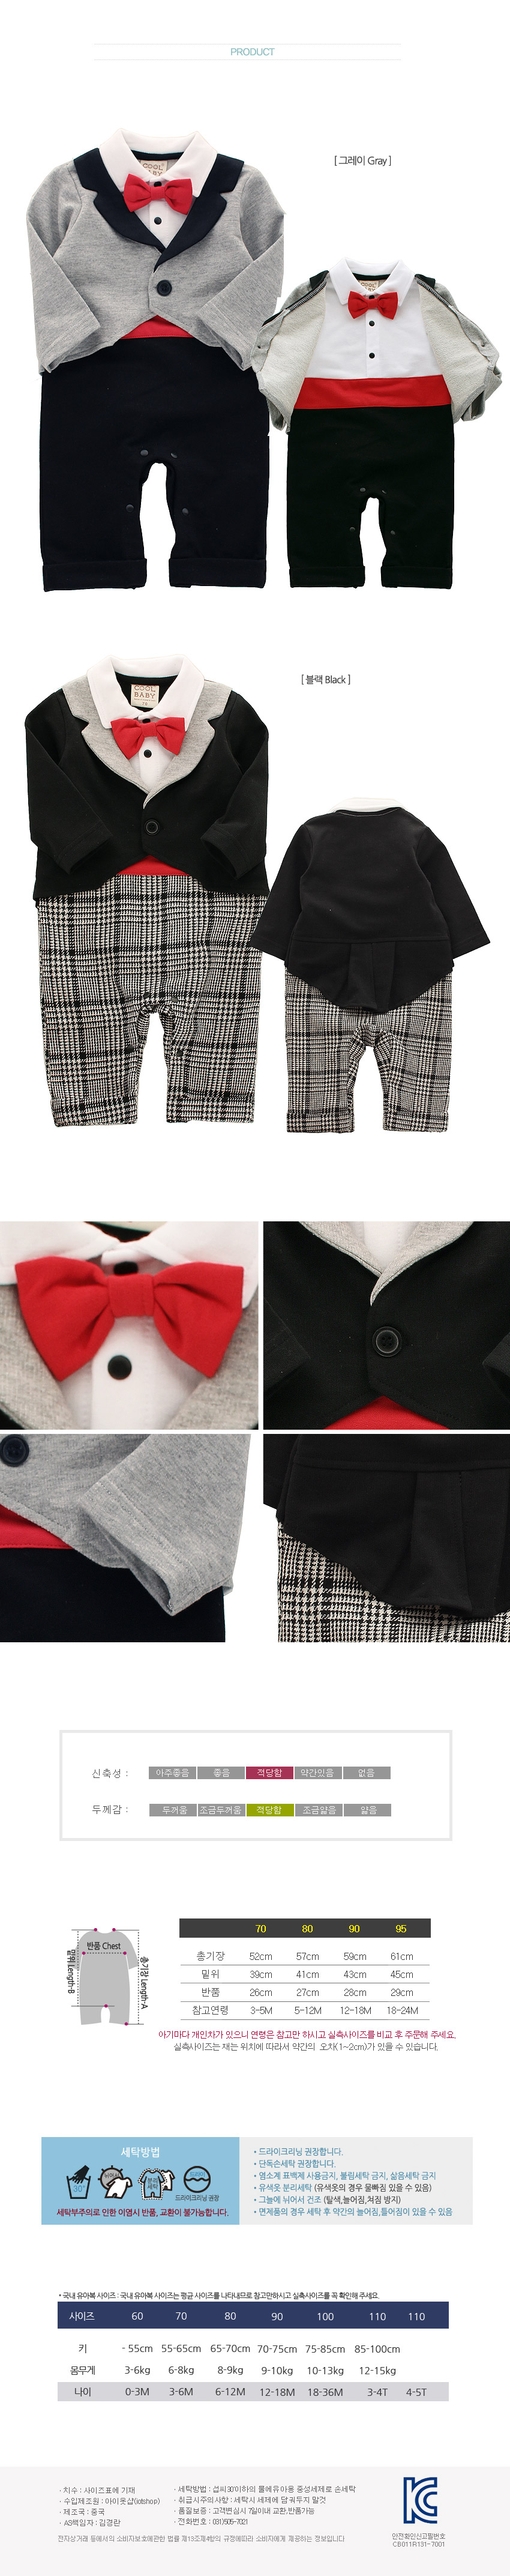 [ BABYMAX ] [ BABYMAX ]蹒跚学步的红色 bowtie Tuxedo Romper 1309